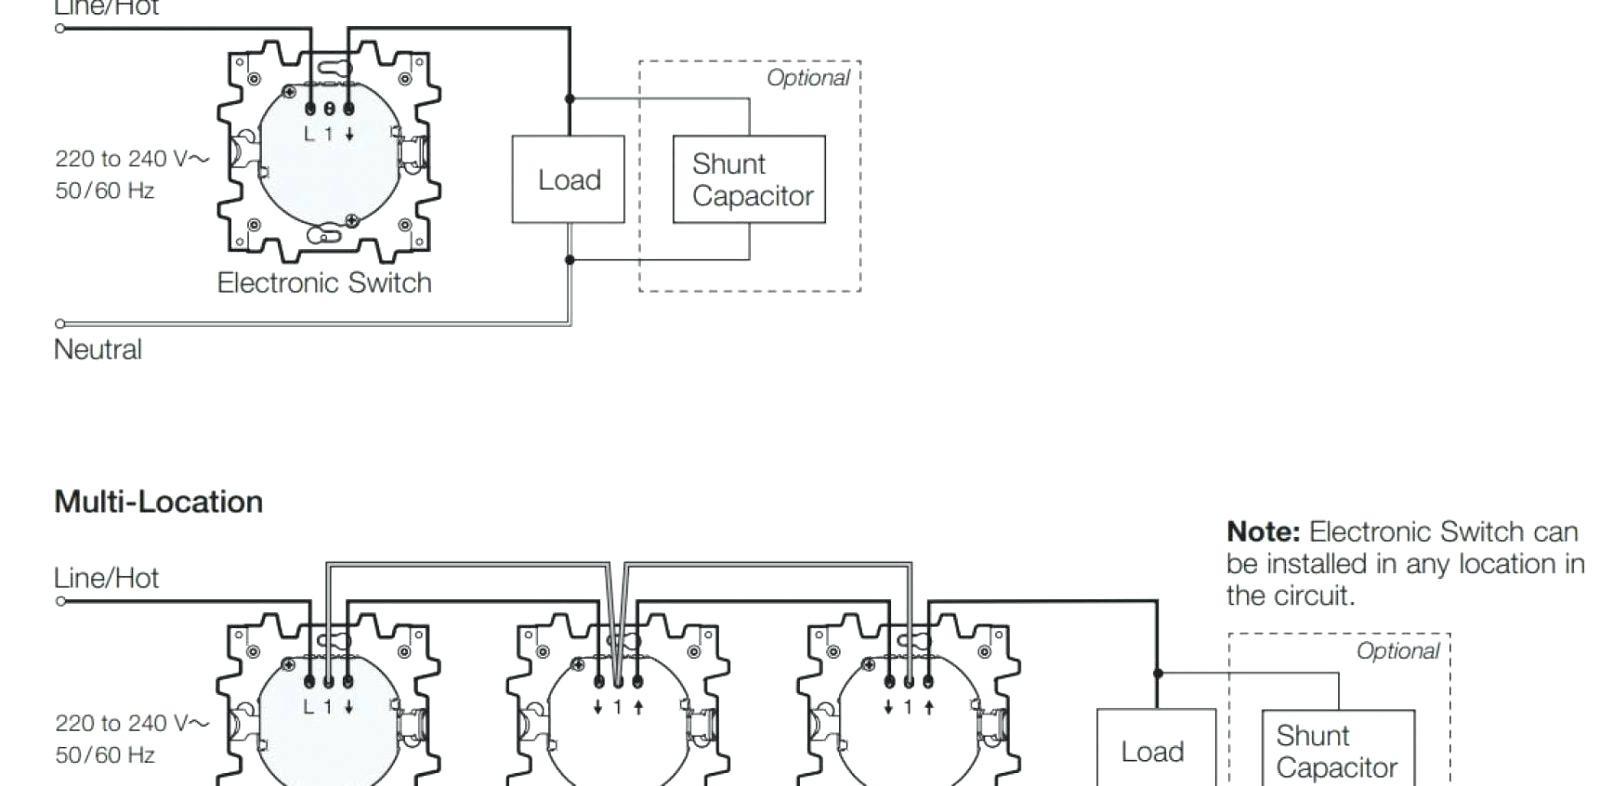 Lutron Maestro Wiring Diagram Multi Location Dimmer Ecosystem Random 2 Lutron Maestro Wiring Diagram